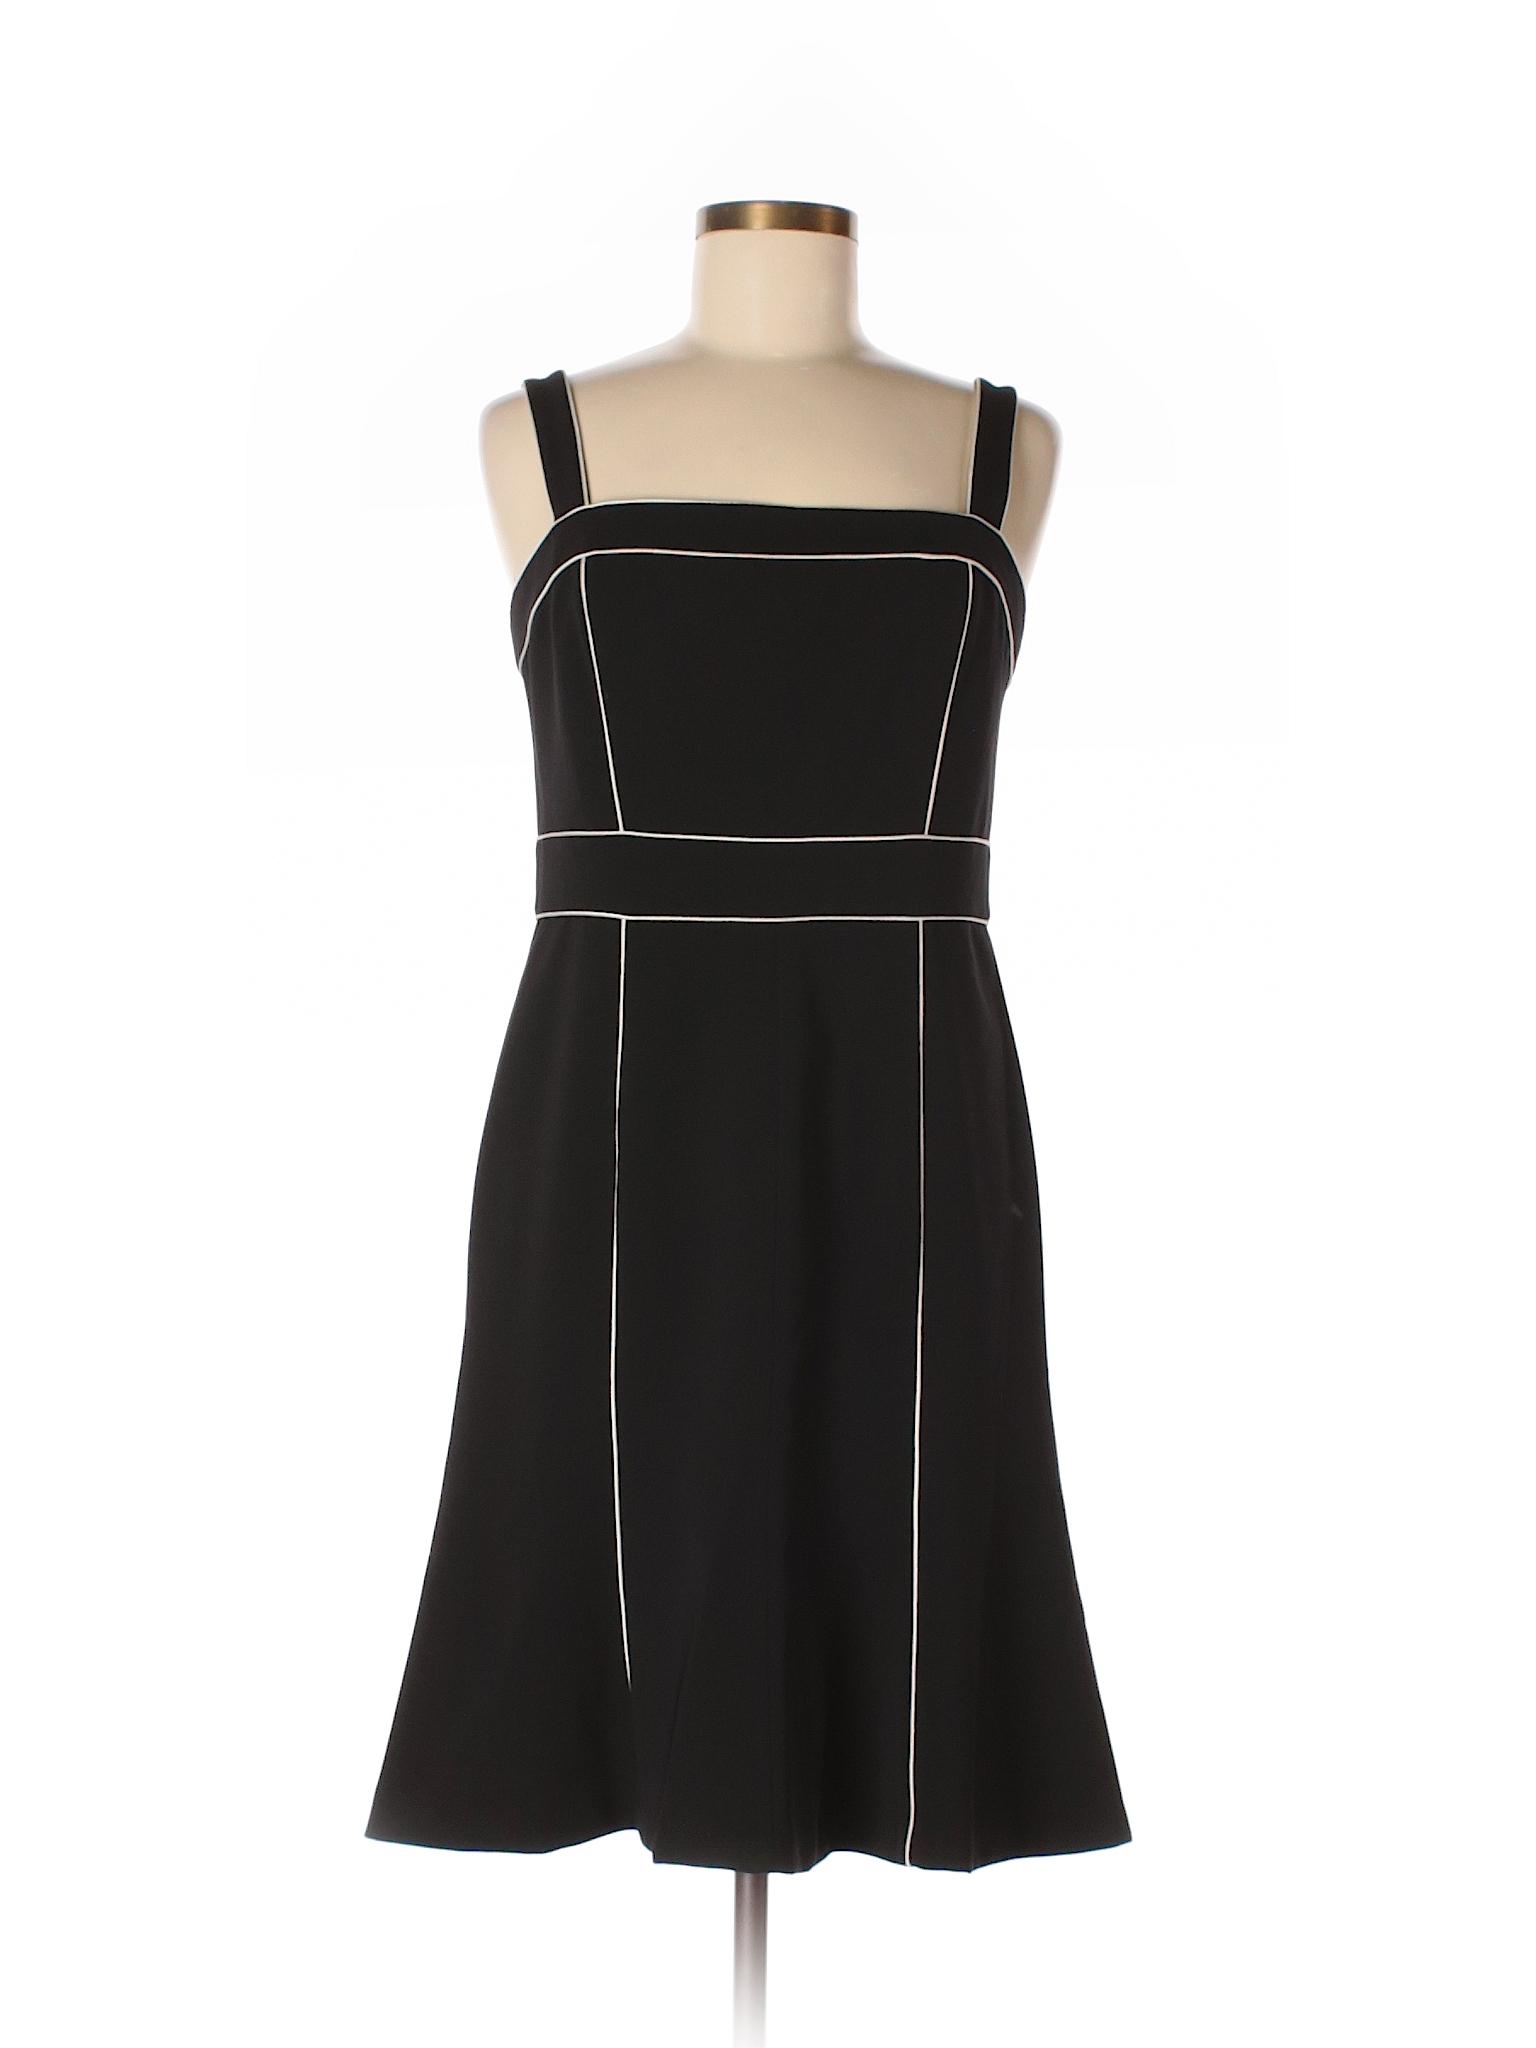 winter Dress New York Boutique Casual 148 Lafayette fSzqBwB0